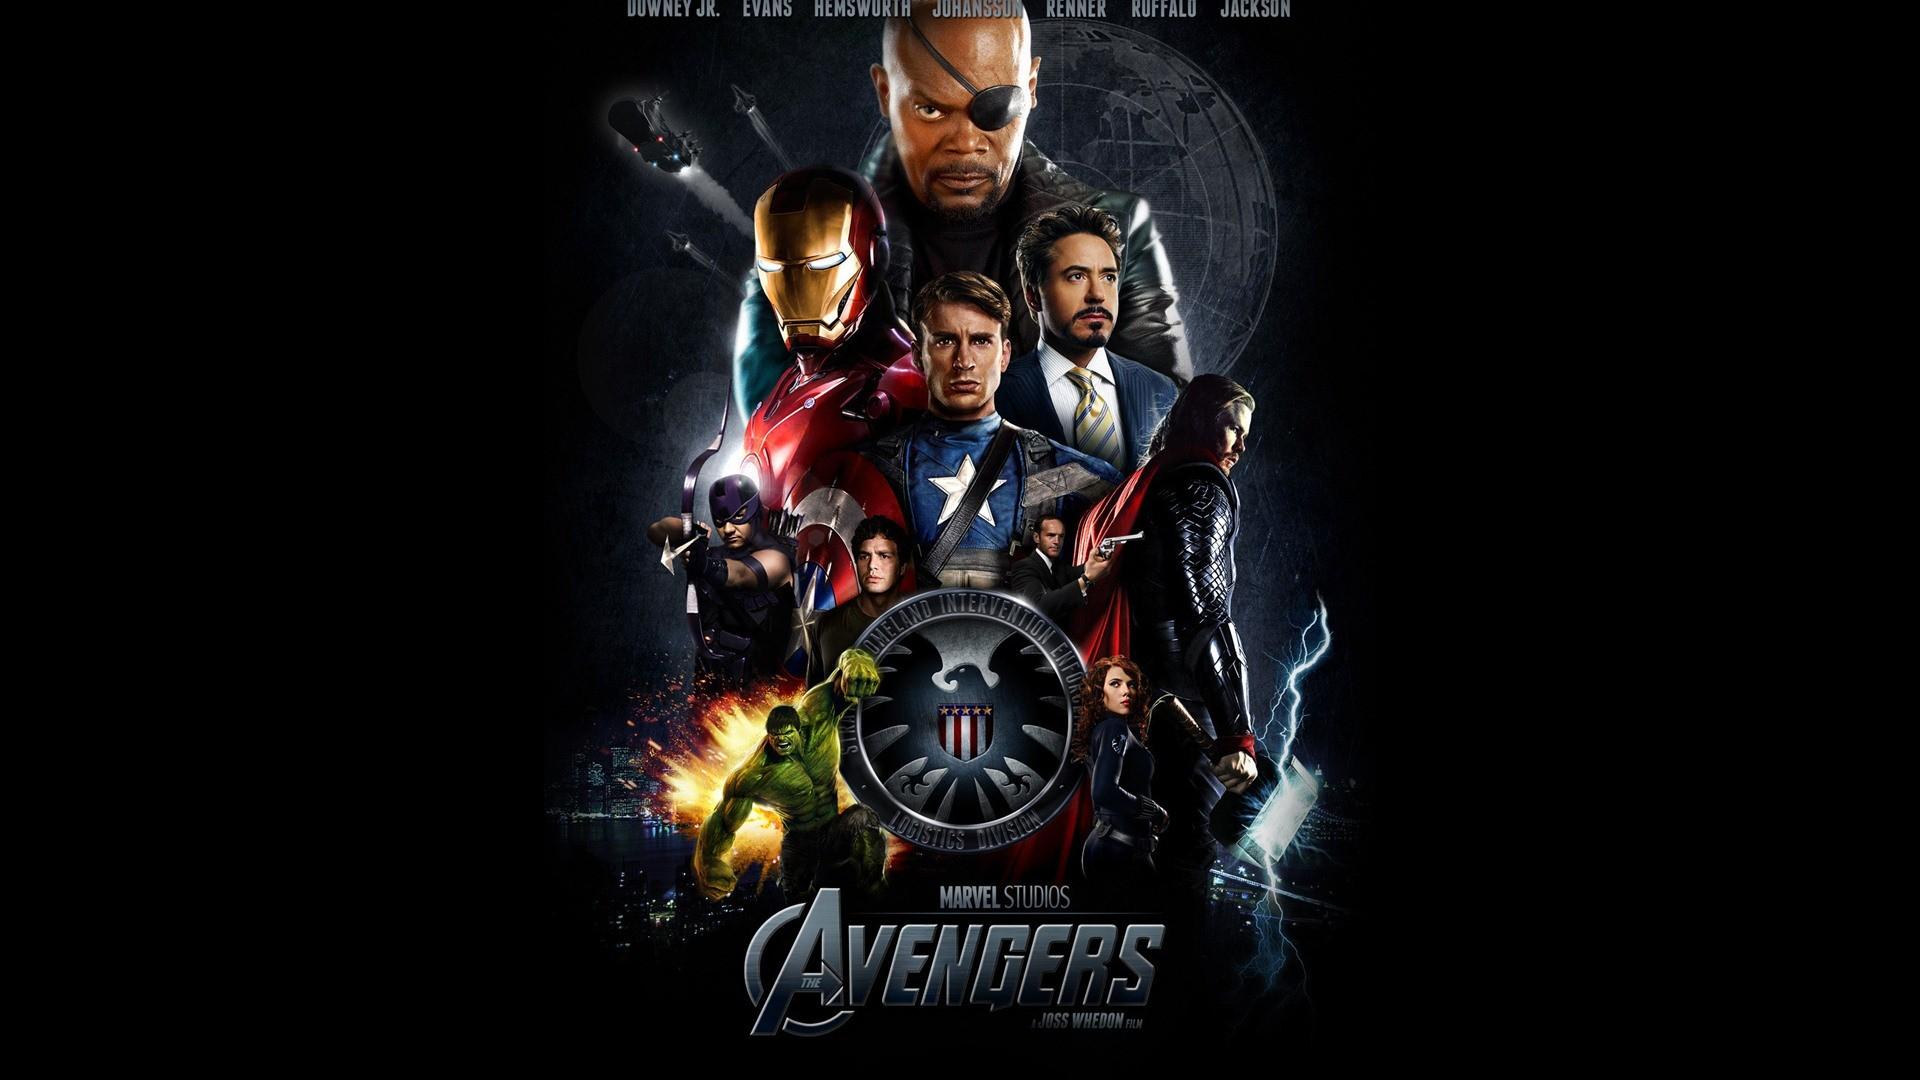 Avengers HD Wallpapers Backgrounds Wallpaper 1920×1080 Avengers Hd Wallpaper  (43 Wallpapers) | Adorable Wallpapers | Wallpapers | Pinterest | Hd  wallpaper, …